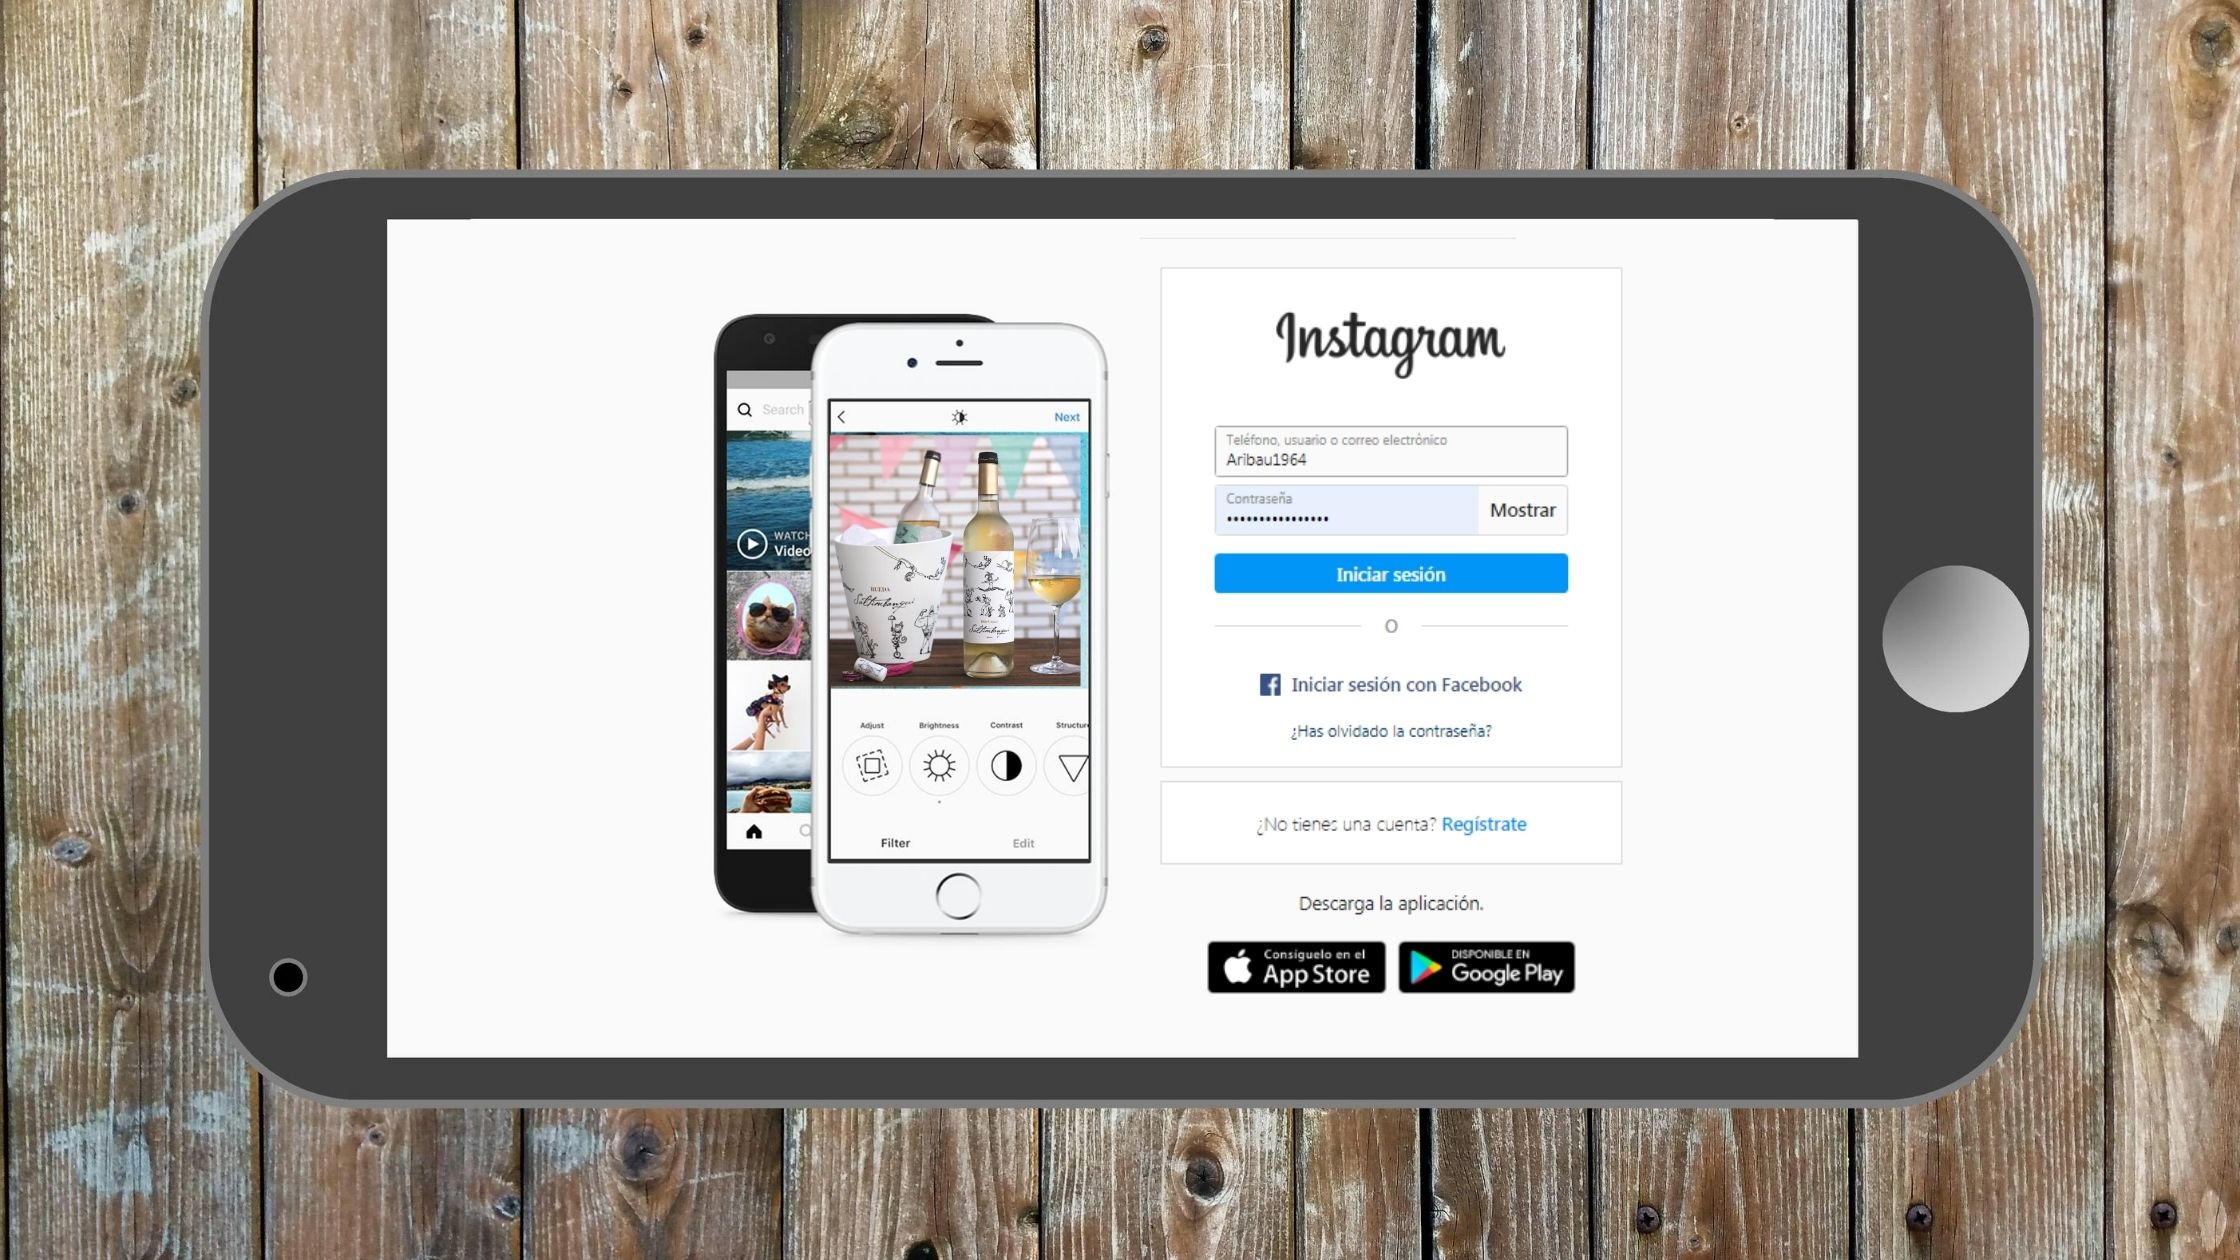 Aribau estrena nou Instagram